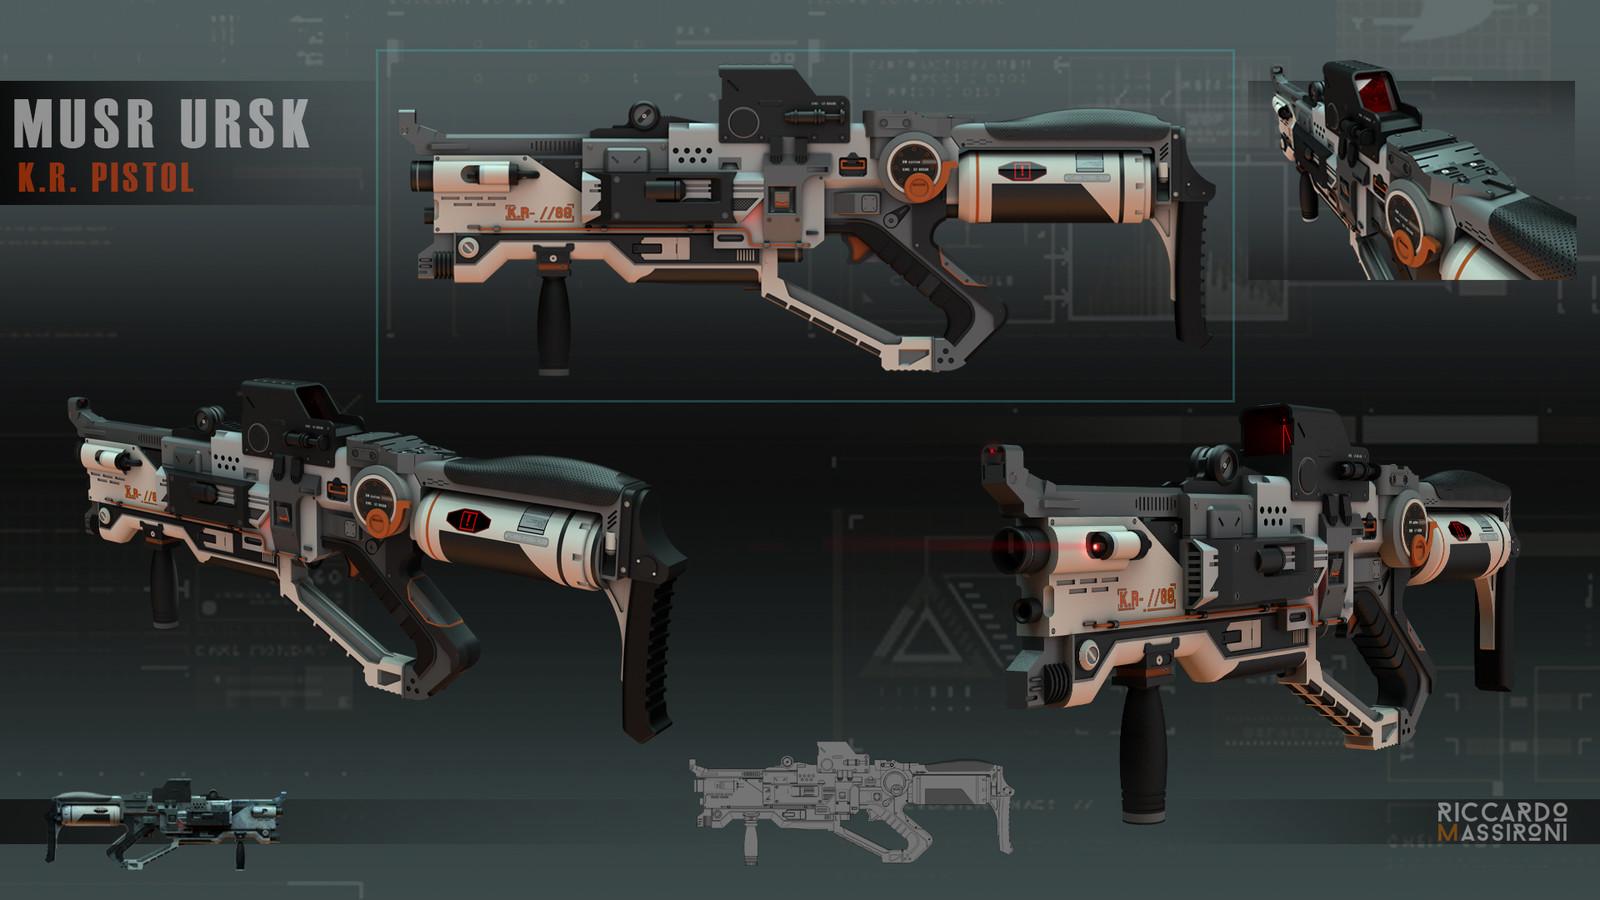 MURS URKS - Pistol